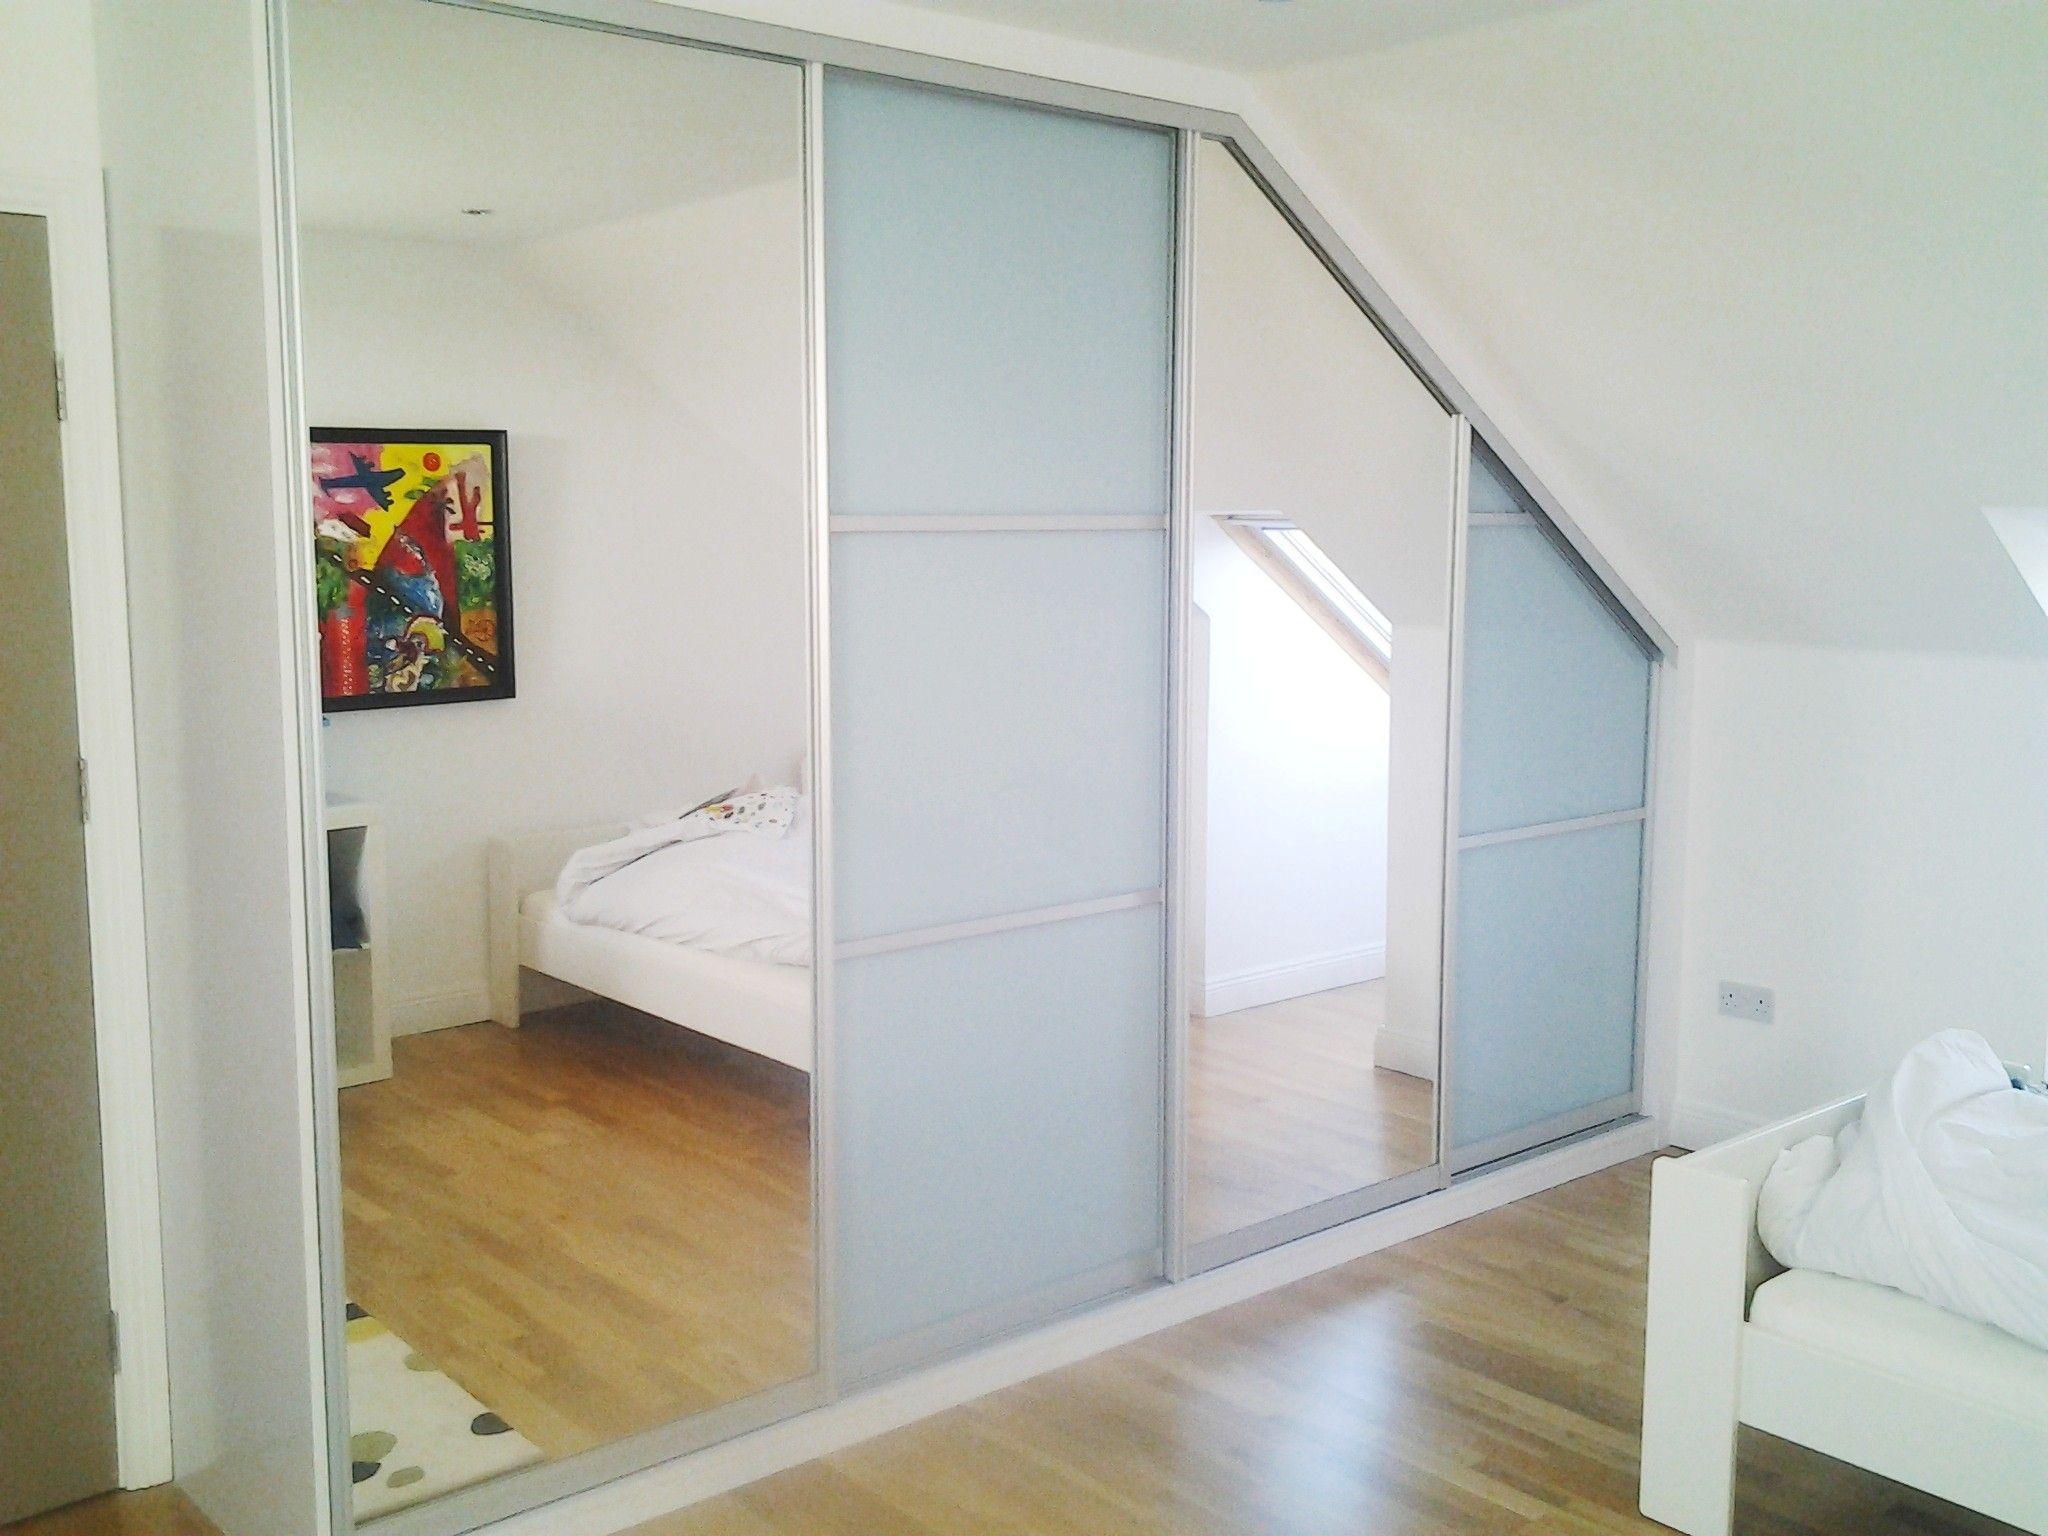 Angled Ceiling Sliding Wardrobe Sliding Wardrobe Sliding Wardrobe Doors Home Upgrades